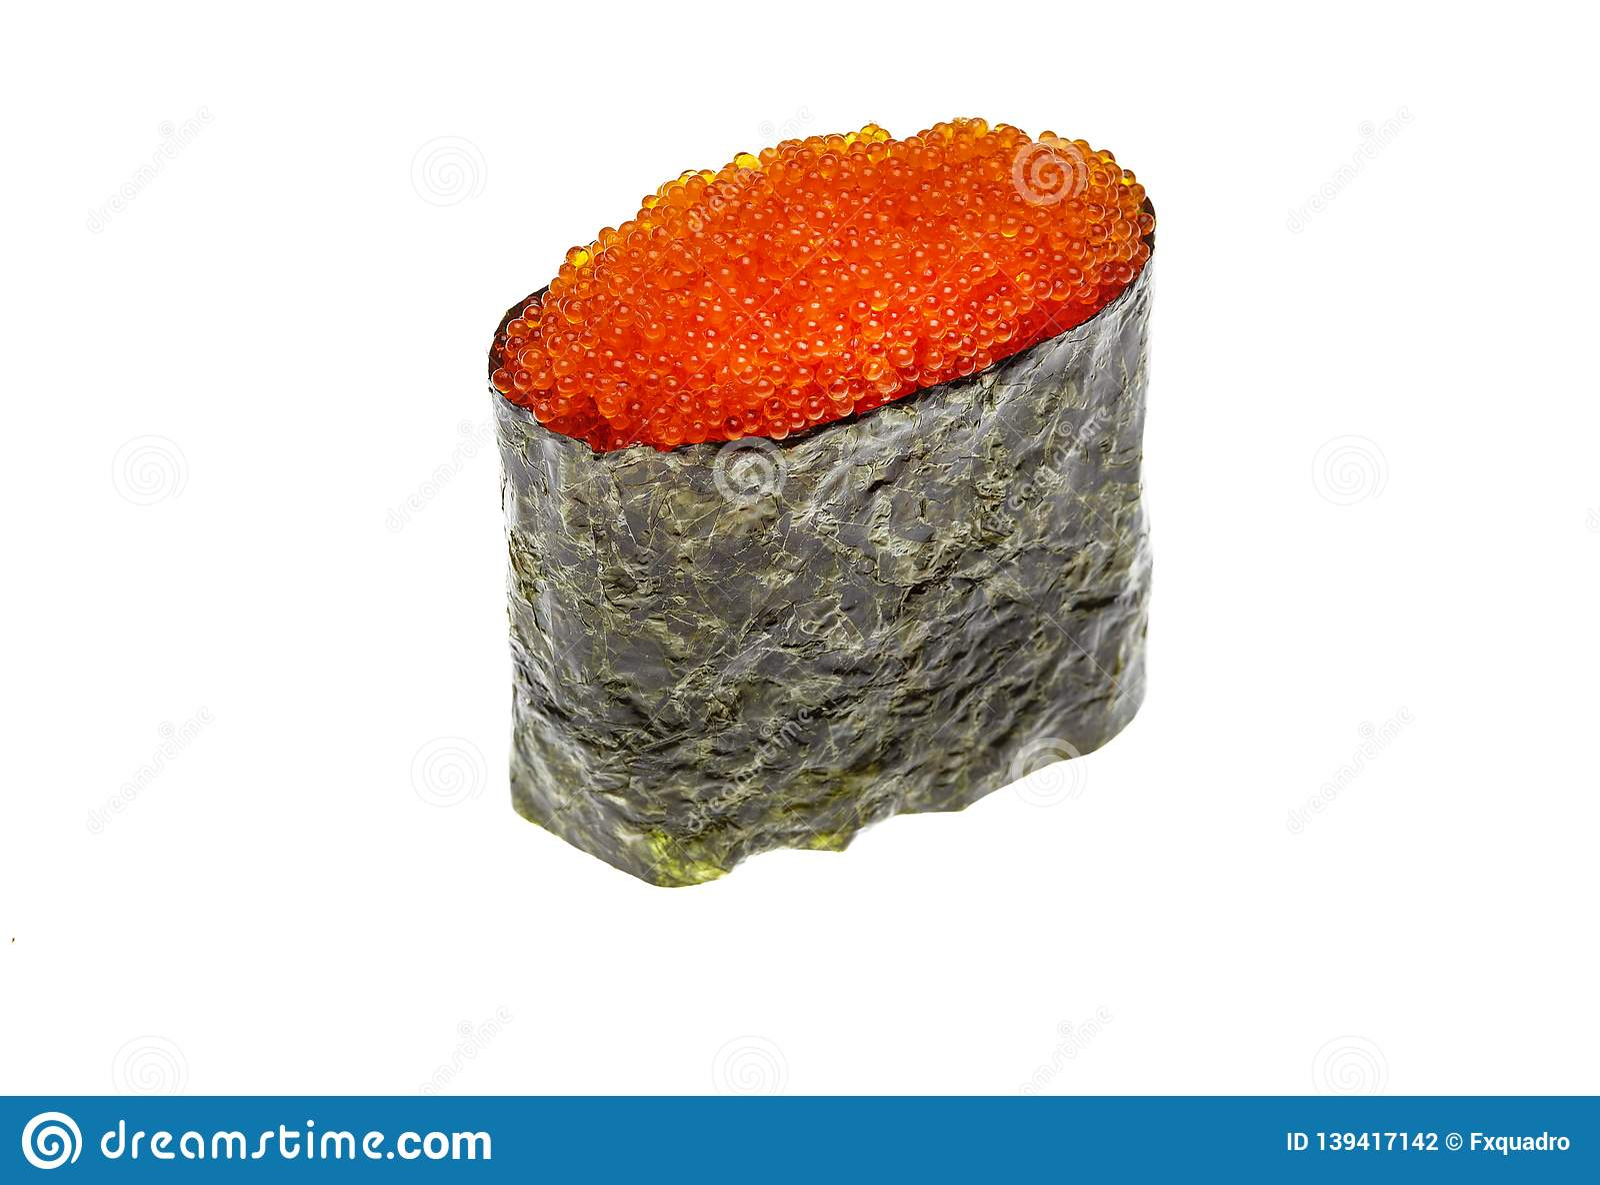 Fresh Gunkan Maki Sushi Rolls With Red Caviar Isolated On A